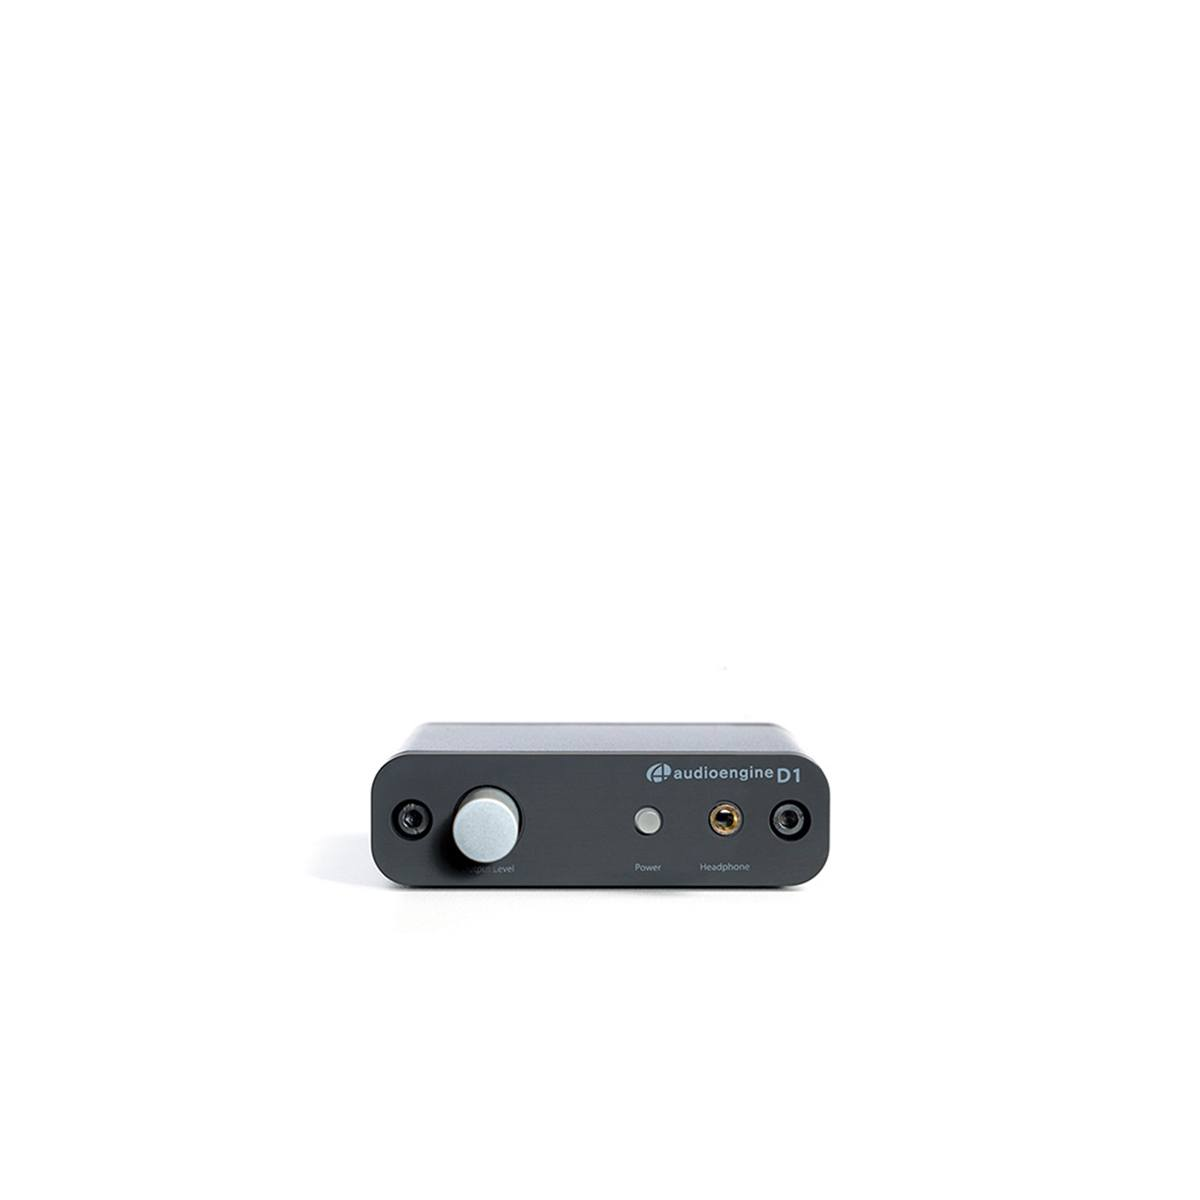 Audioengine D1 24-Bit DAC With Headphone Amp Black